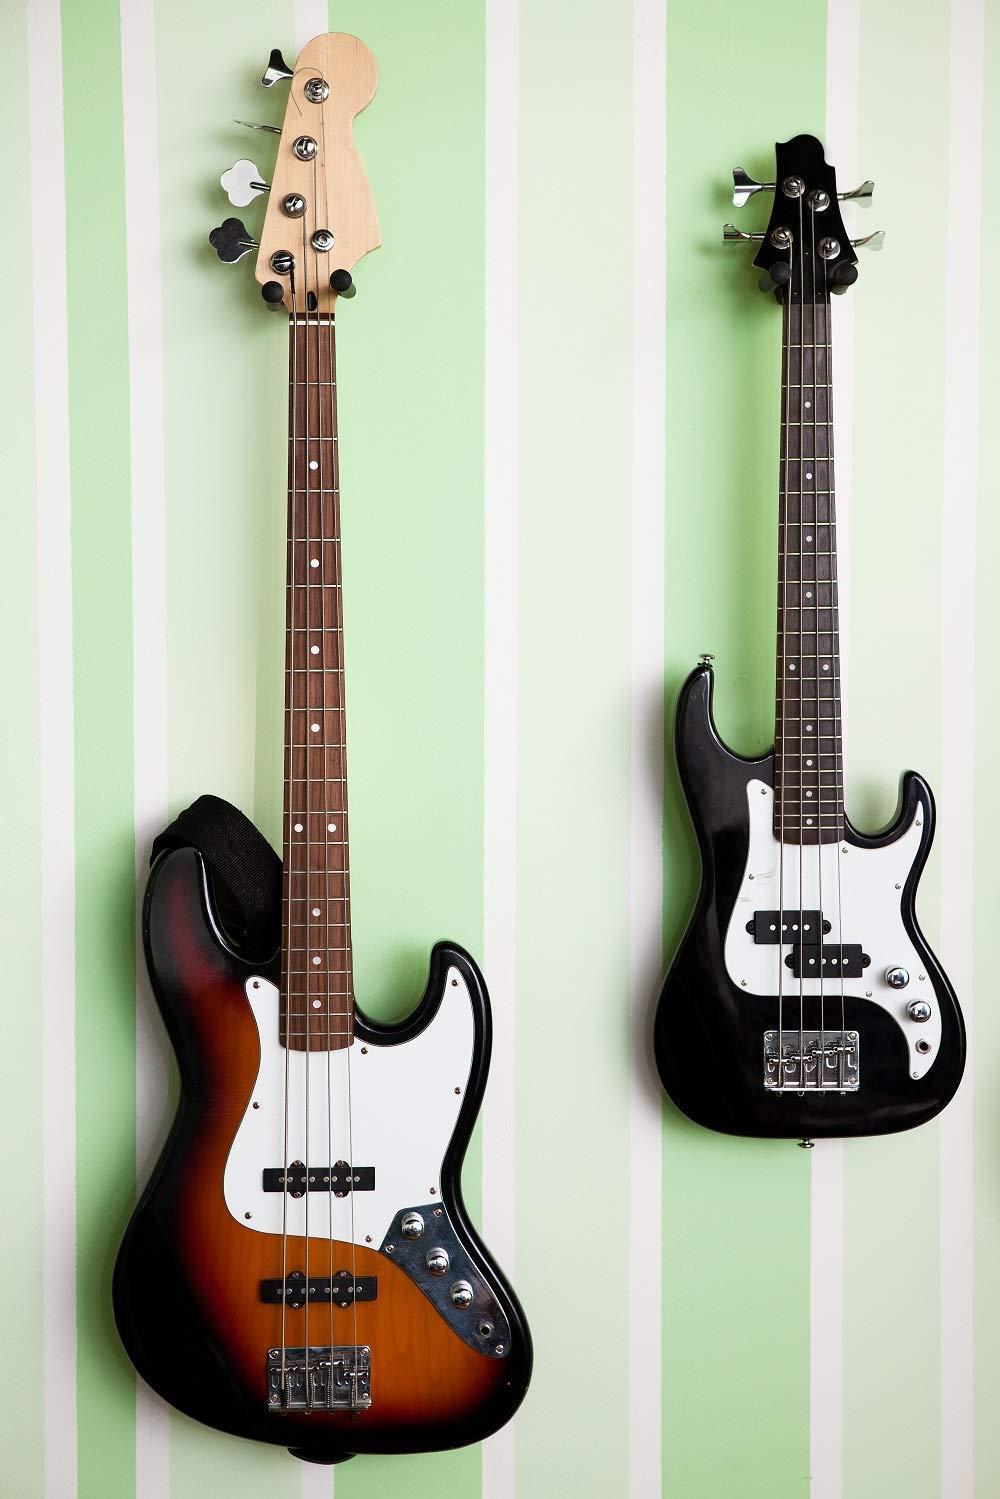 Soporte de montaje en pared para guitarra Ohuhu, 2 paquetes ...